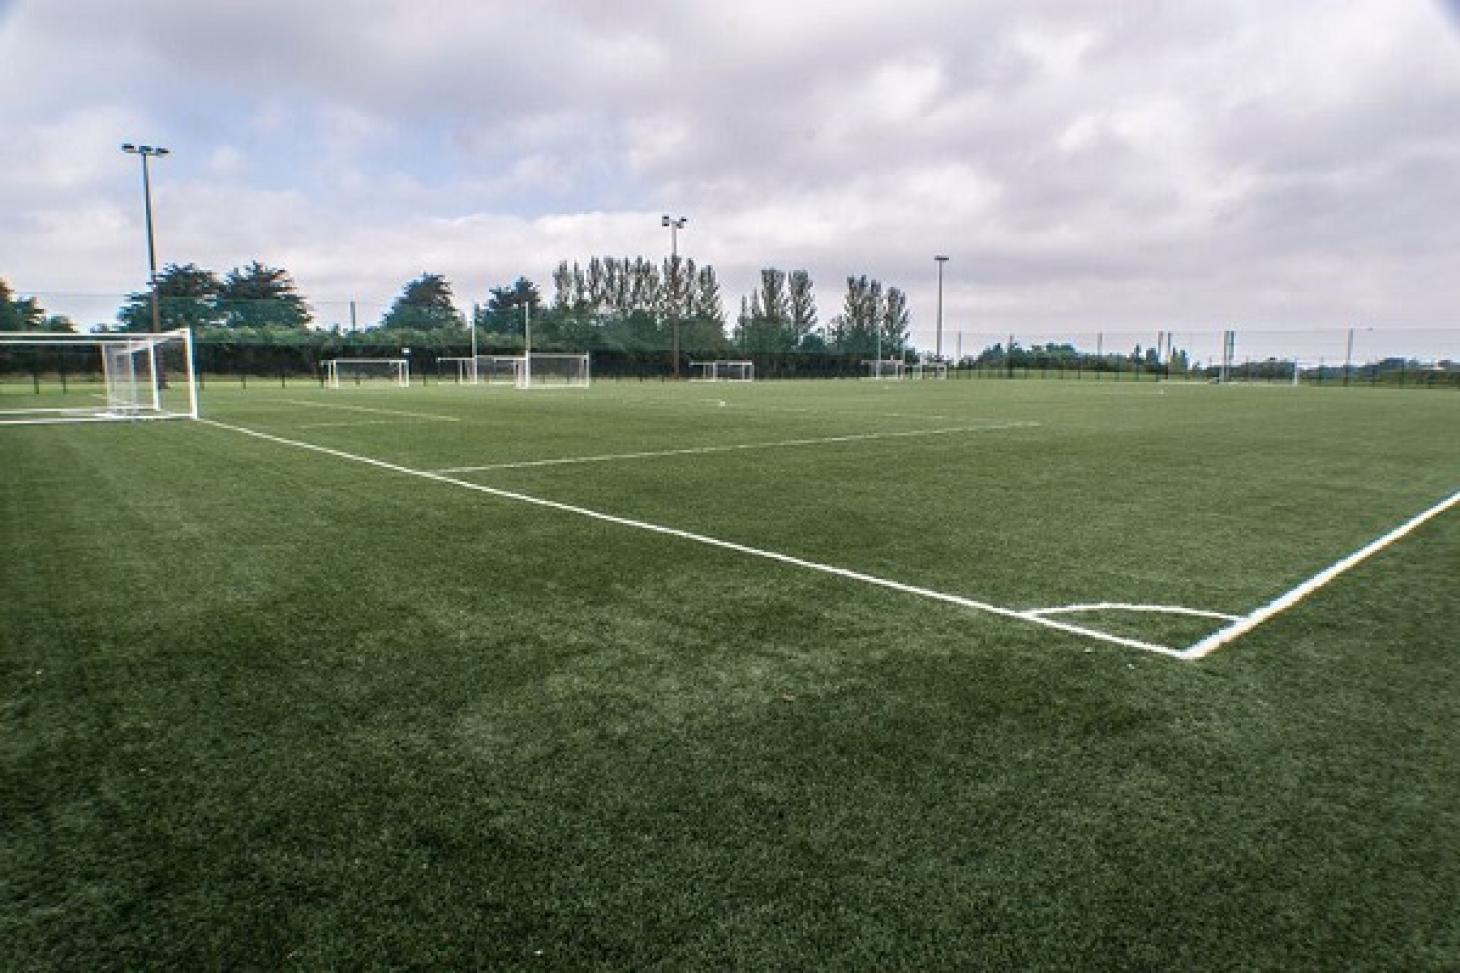 dlr Marlay 11 a side | Astroturf football pitch